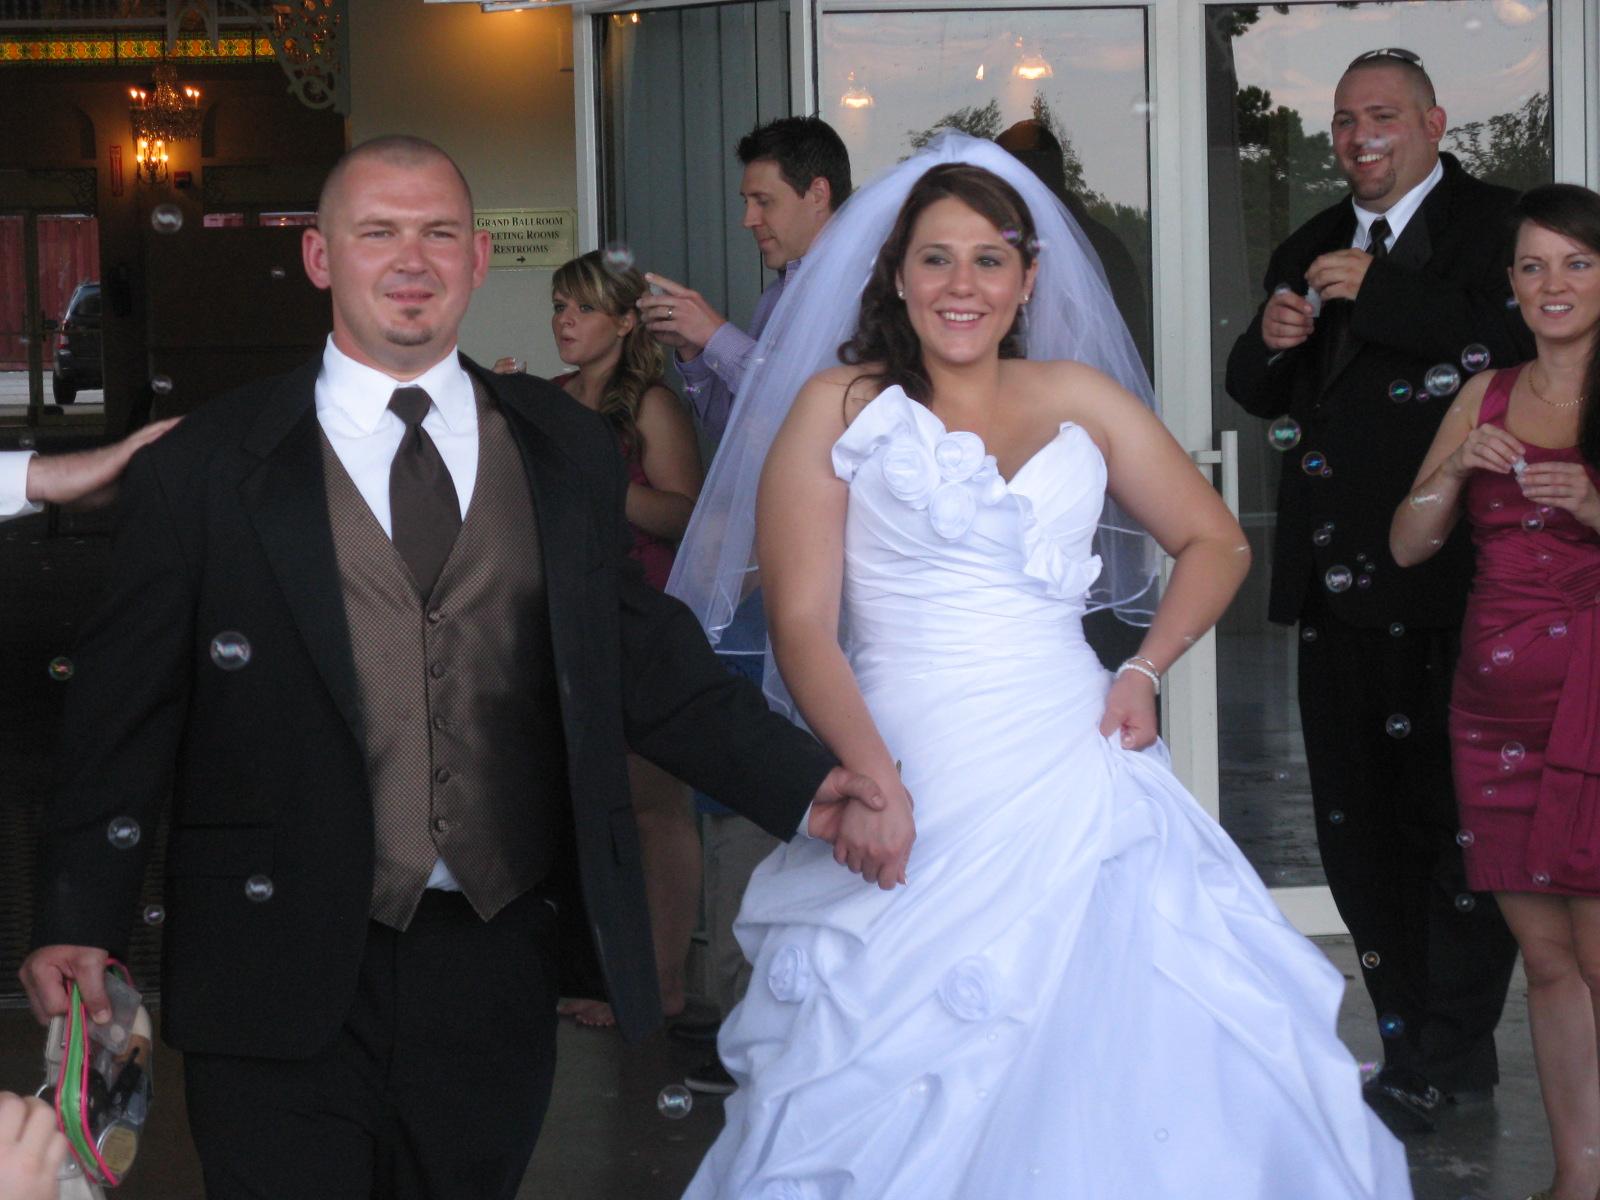 http://3.bp.blogspot.com/-1Xt9ysz6t8c/Tm0Q1278m1I/AAAAAAAAAOo/w_WluiQ1OOY/s1600/Christen+%2526+Andrew%2527s+Wedding+190.JPG